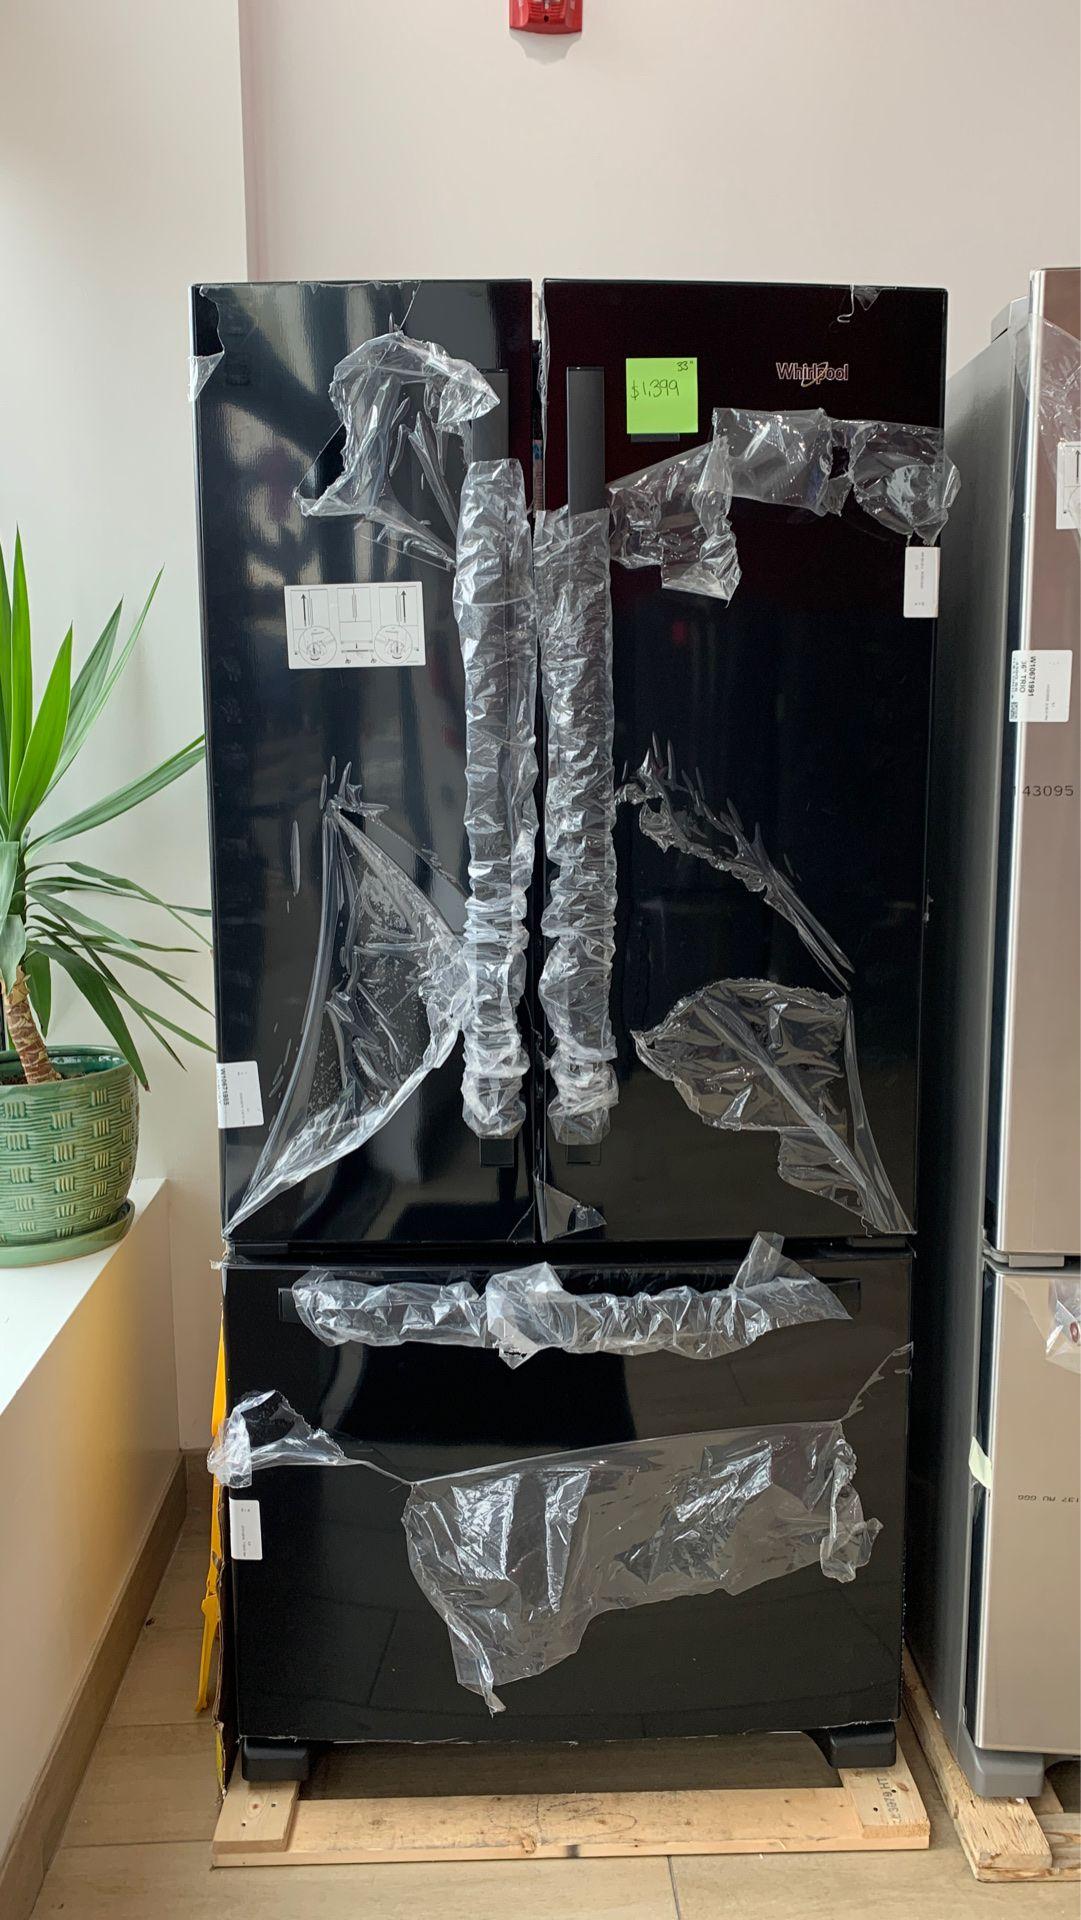 Whirlpool 22 cu. ft. French Door Refrigerator in Black